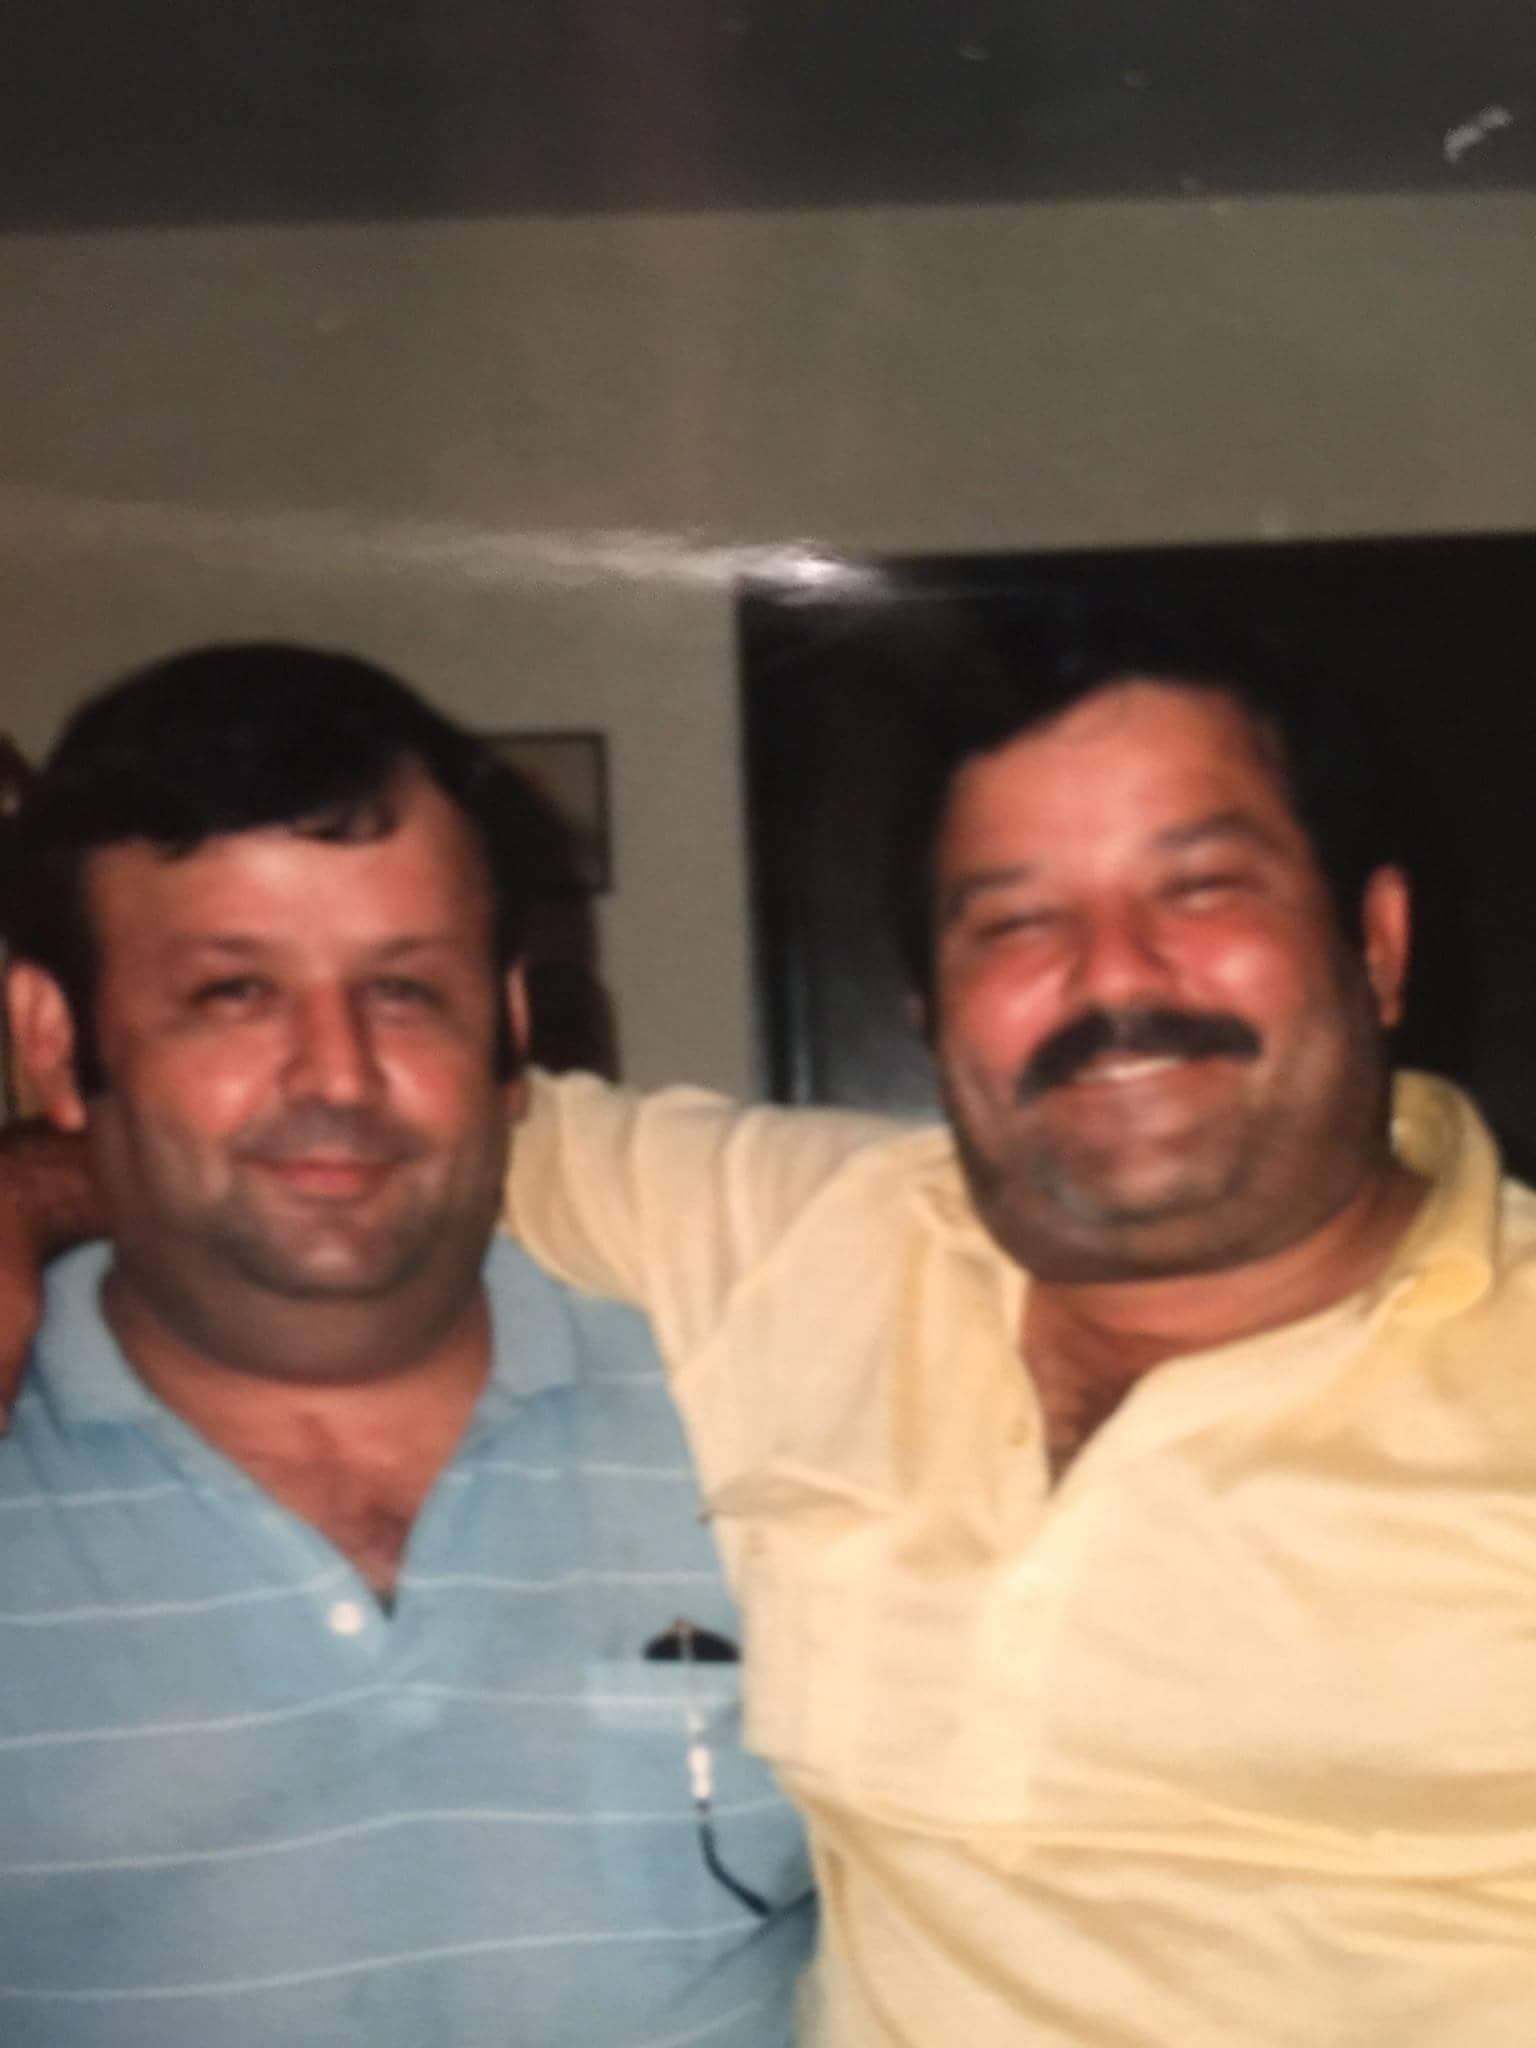 Jose and brother Alonzo-Missouri